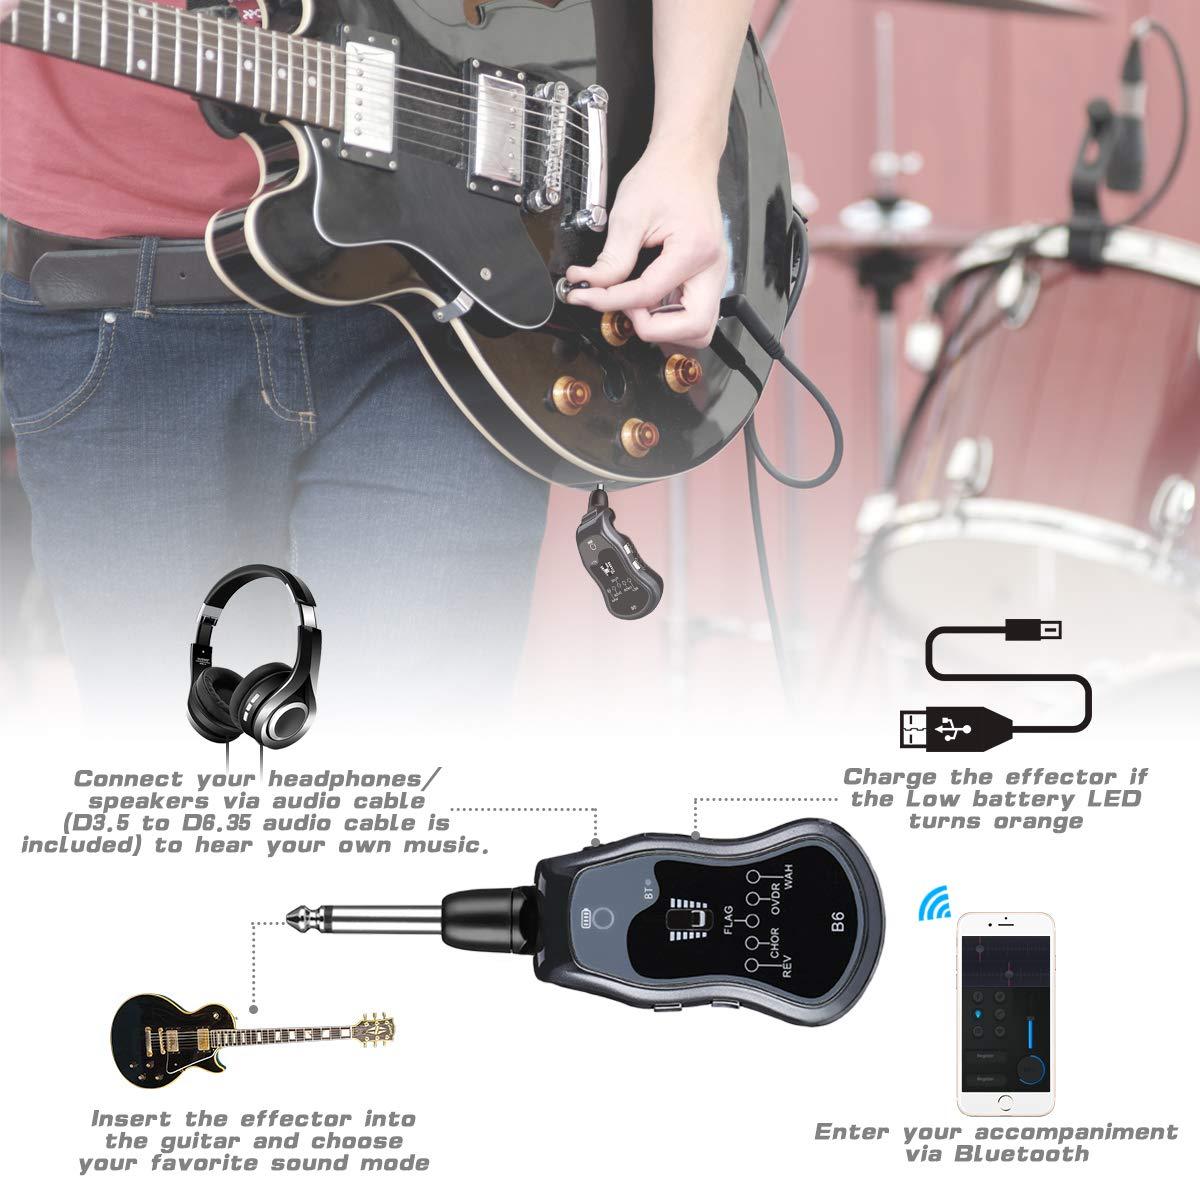 ELEGIANT Mini Amplificador de Guitarra Bluetooth, Transmisor Inalámbrico para Guitarra Eléctrica de Audio Portátil Recargable Sintetizador 5 ...